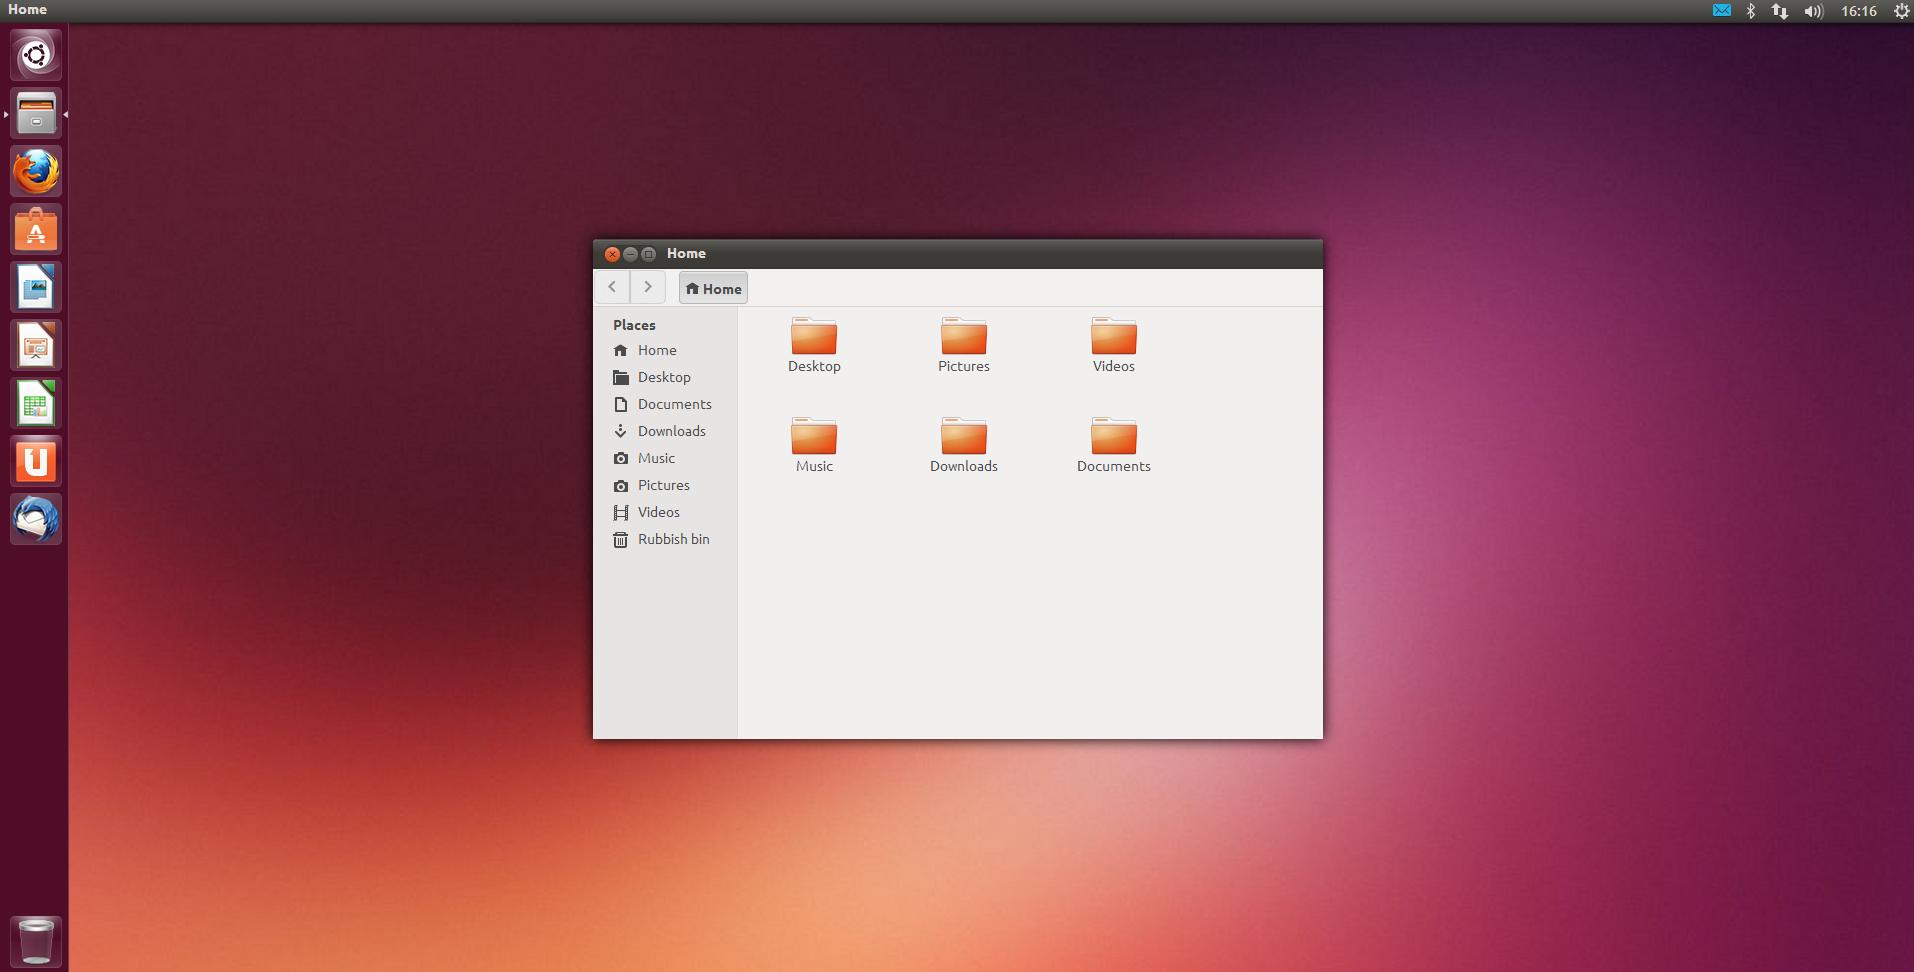 The Ubuntu Desktop With The Windows File Explorer Like Home Folder Open.  Ubuntu Does Not Have Program Finding Tool Similar To Windowsu0027 File Explorer.